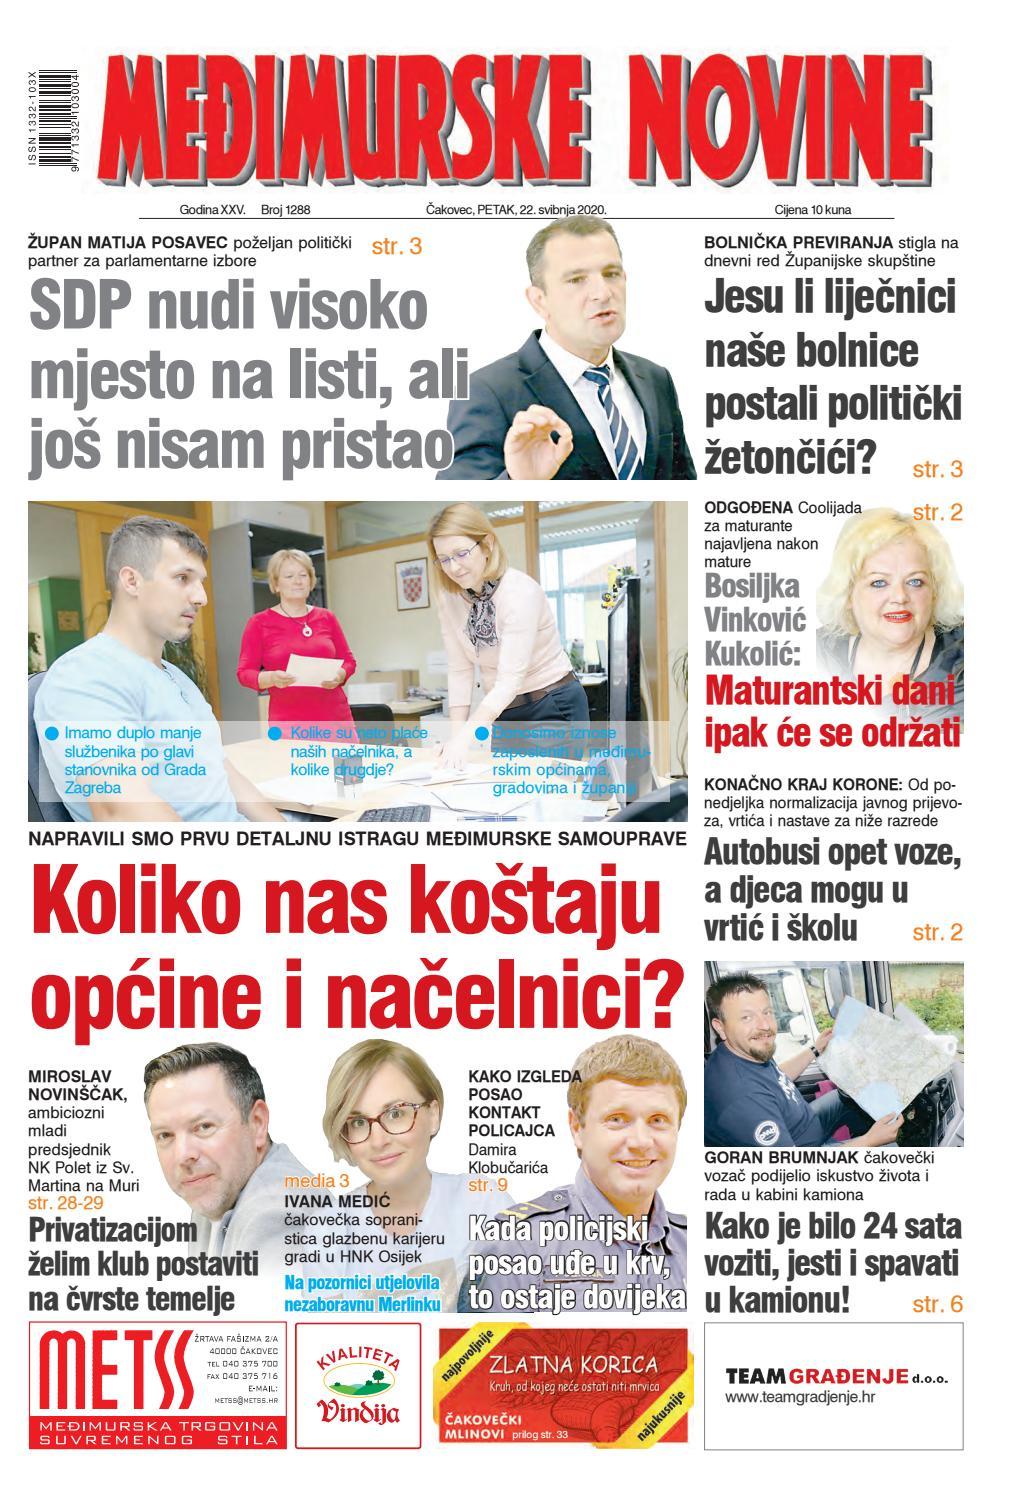 Međimurske novine 1288 by Međimurske novine - www.mnovine